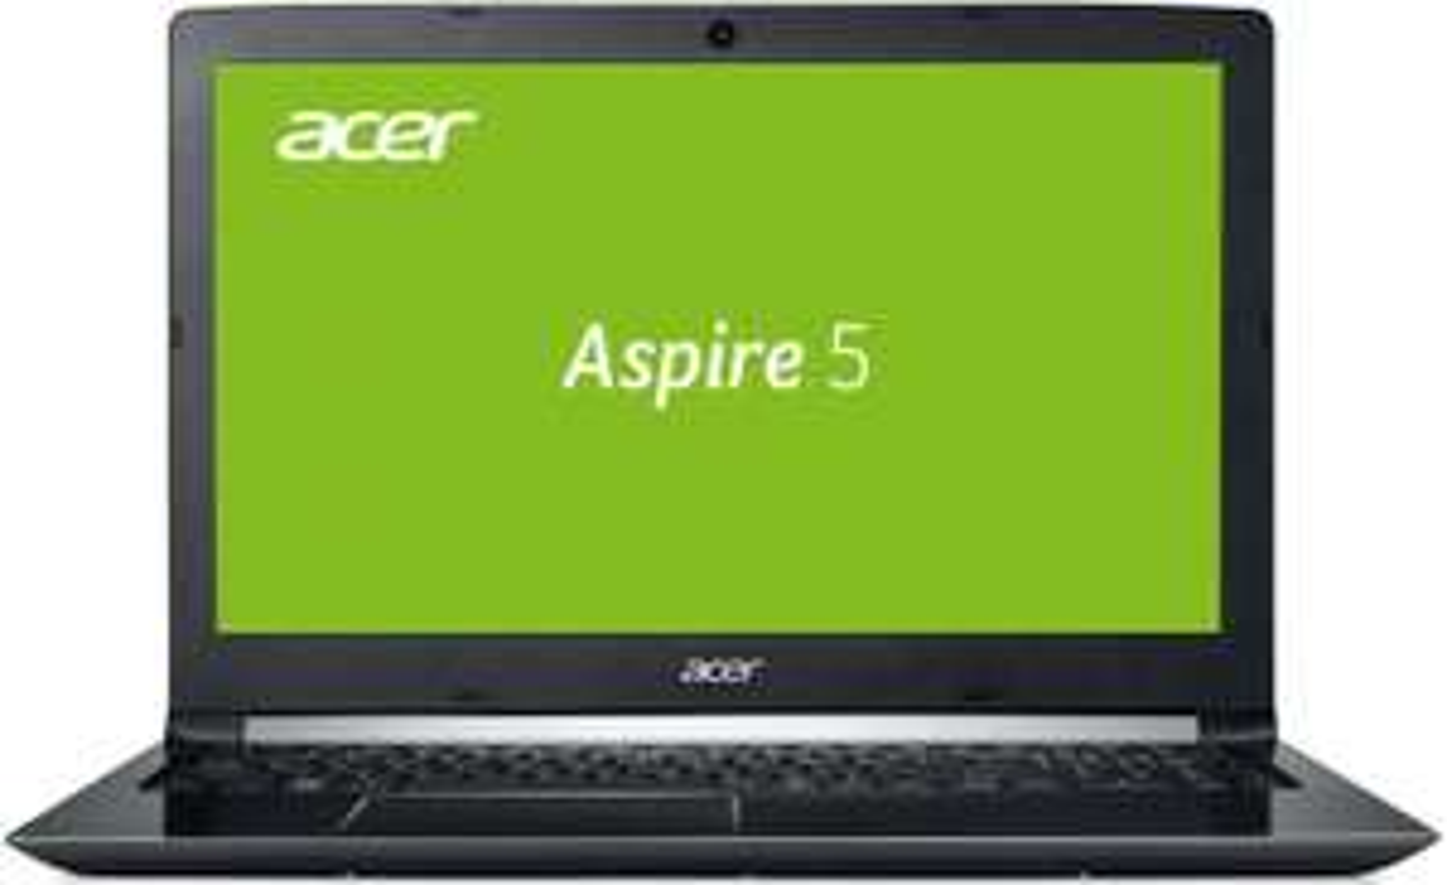 "[eBay/NBB] Notebook 15.6"" Acer Aspire 5 A515 - Full HD IPS, i5-8250U, RAM 8 GB, SSD 256 GB"